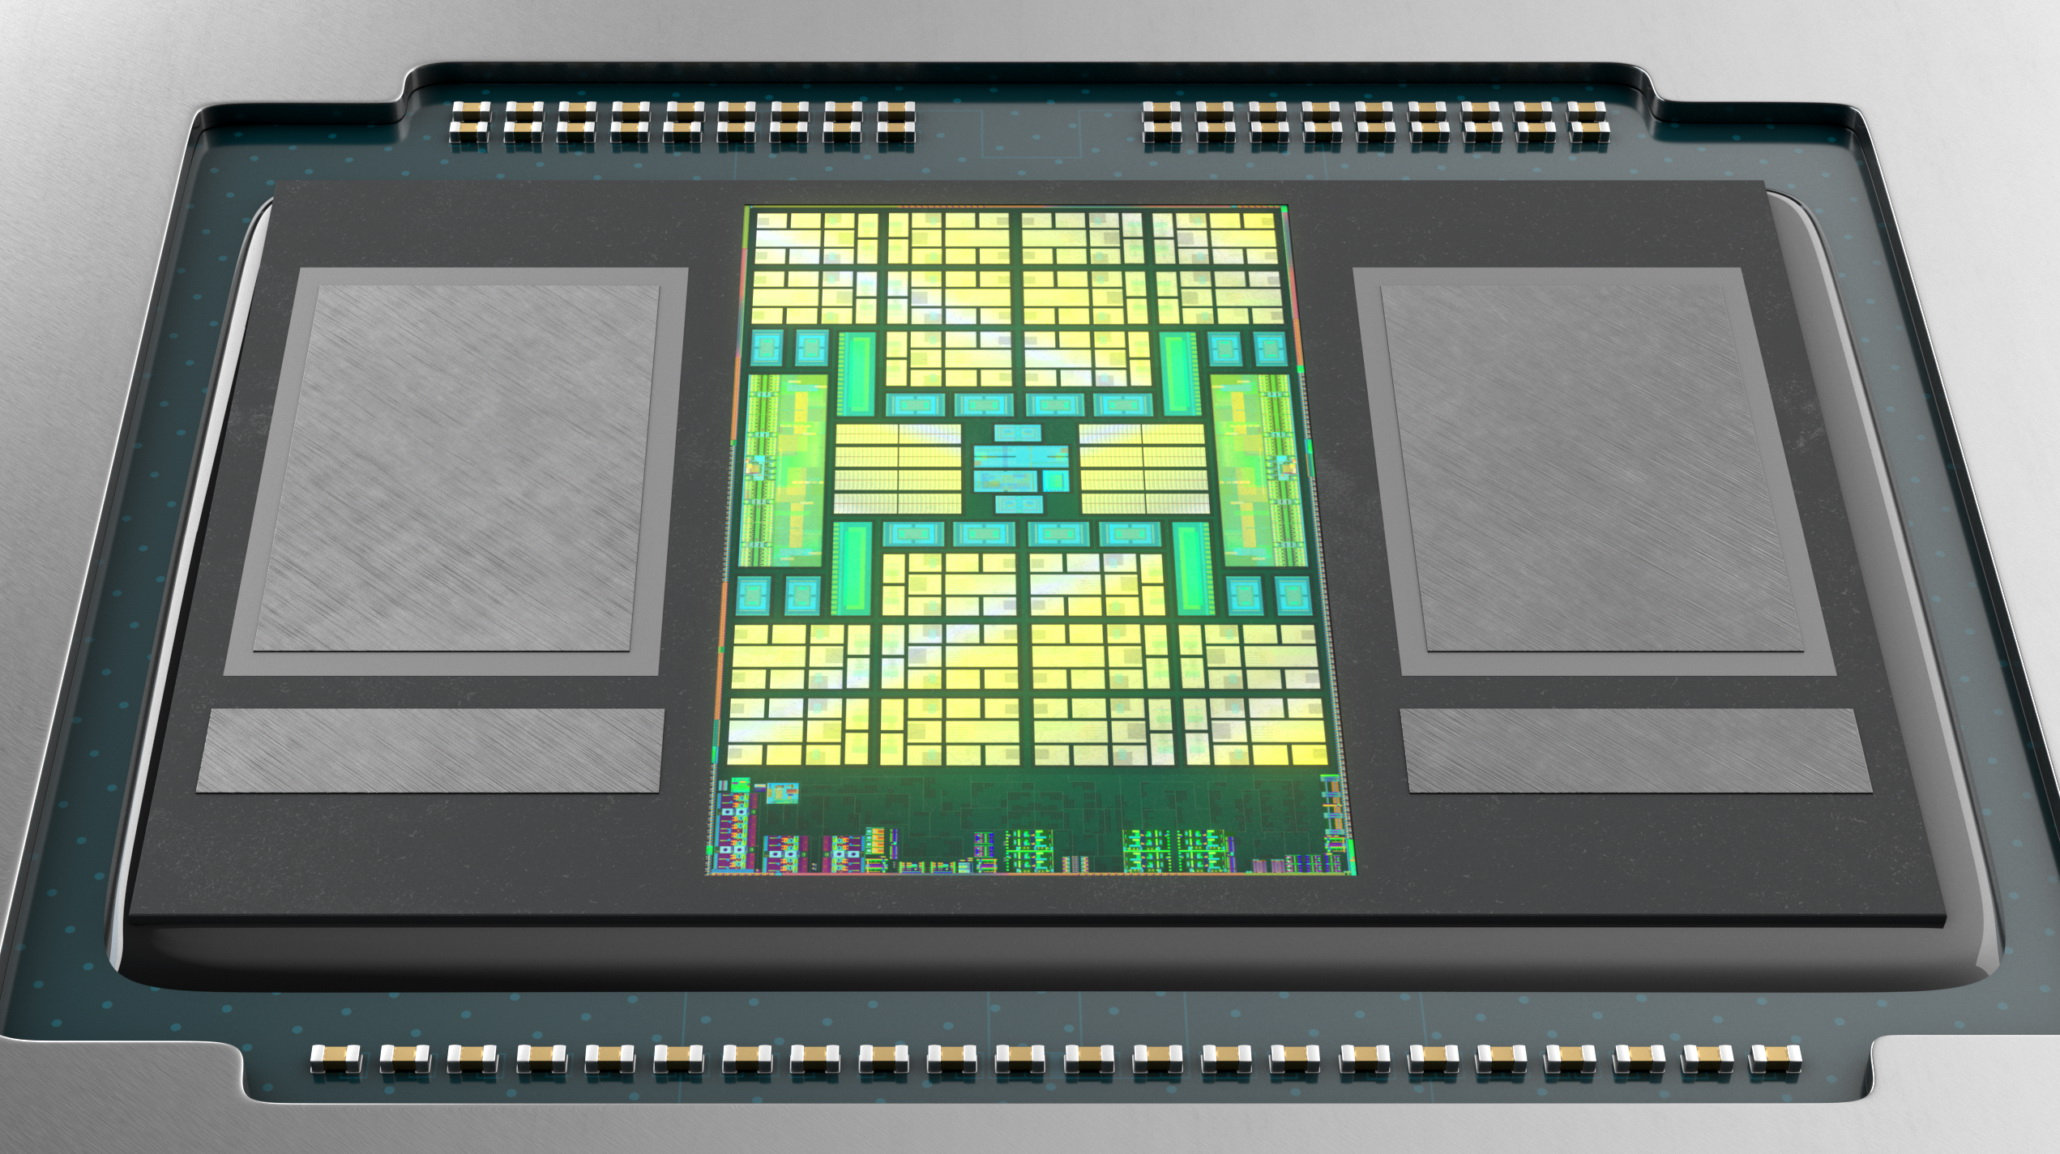 AMD представила Radeon Pro 5600M: мощная видеокарта с HBM2 для Apple MacBook Pro